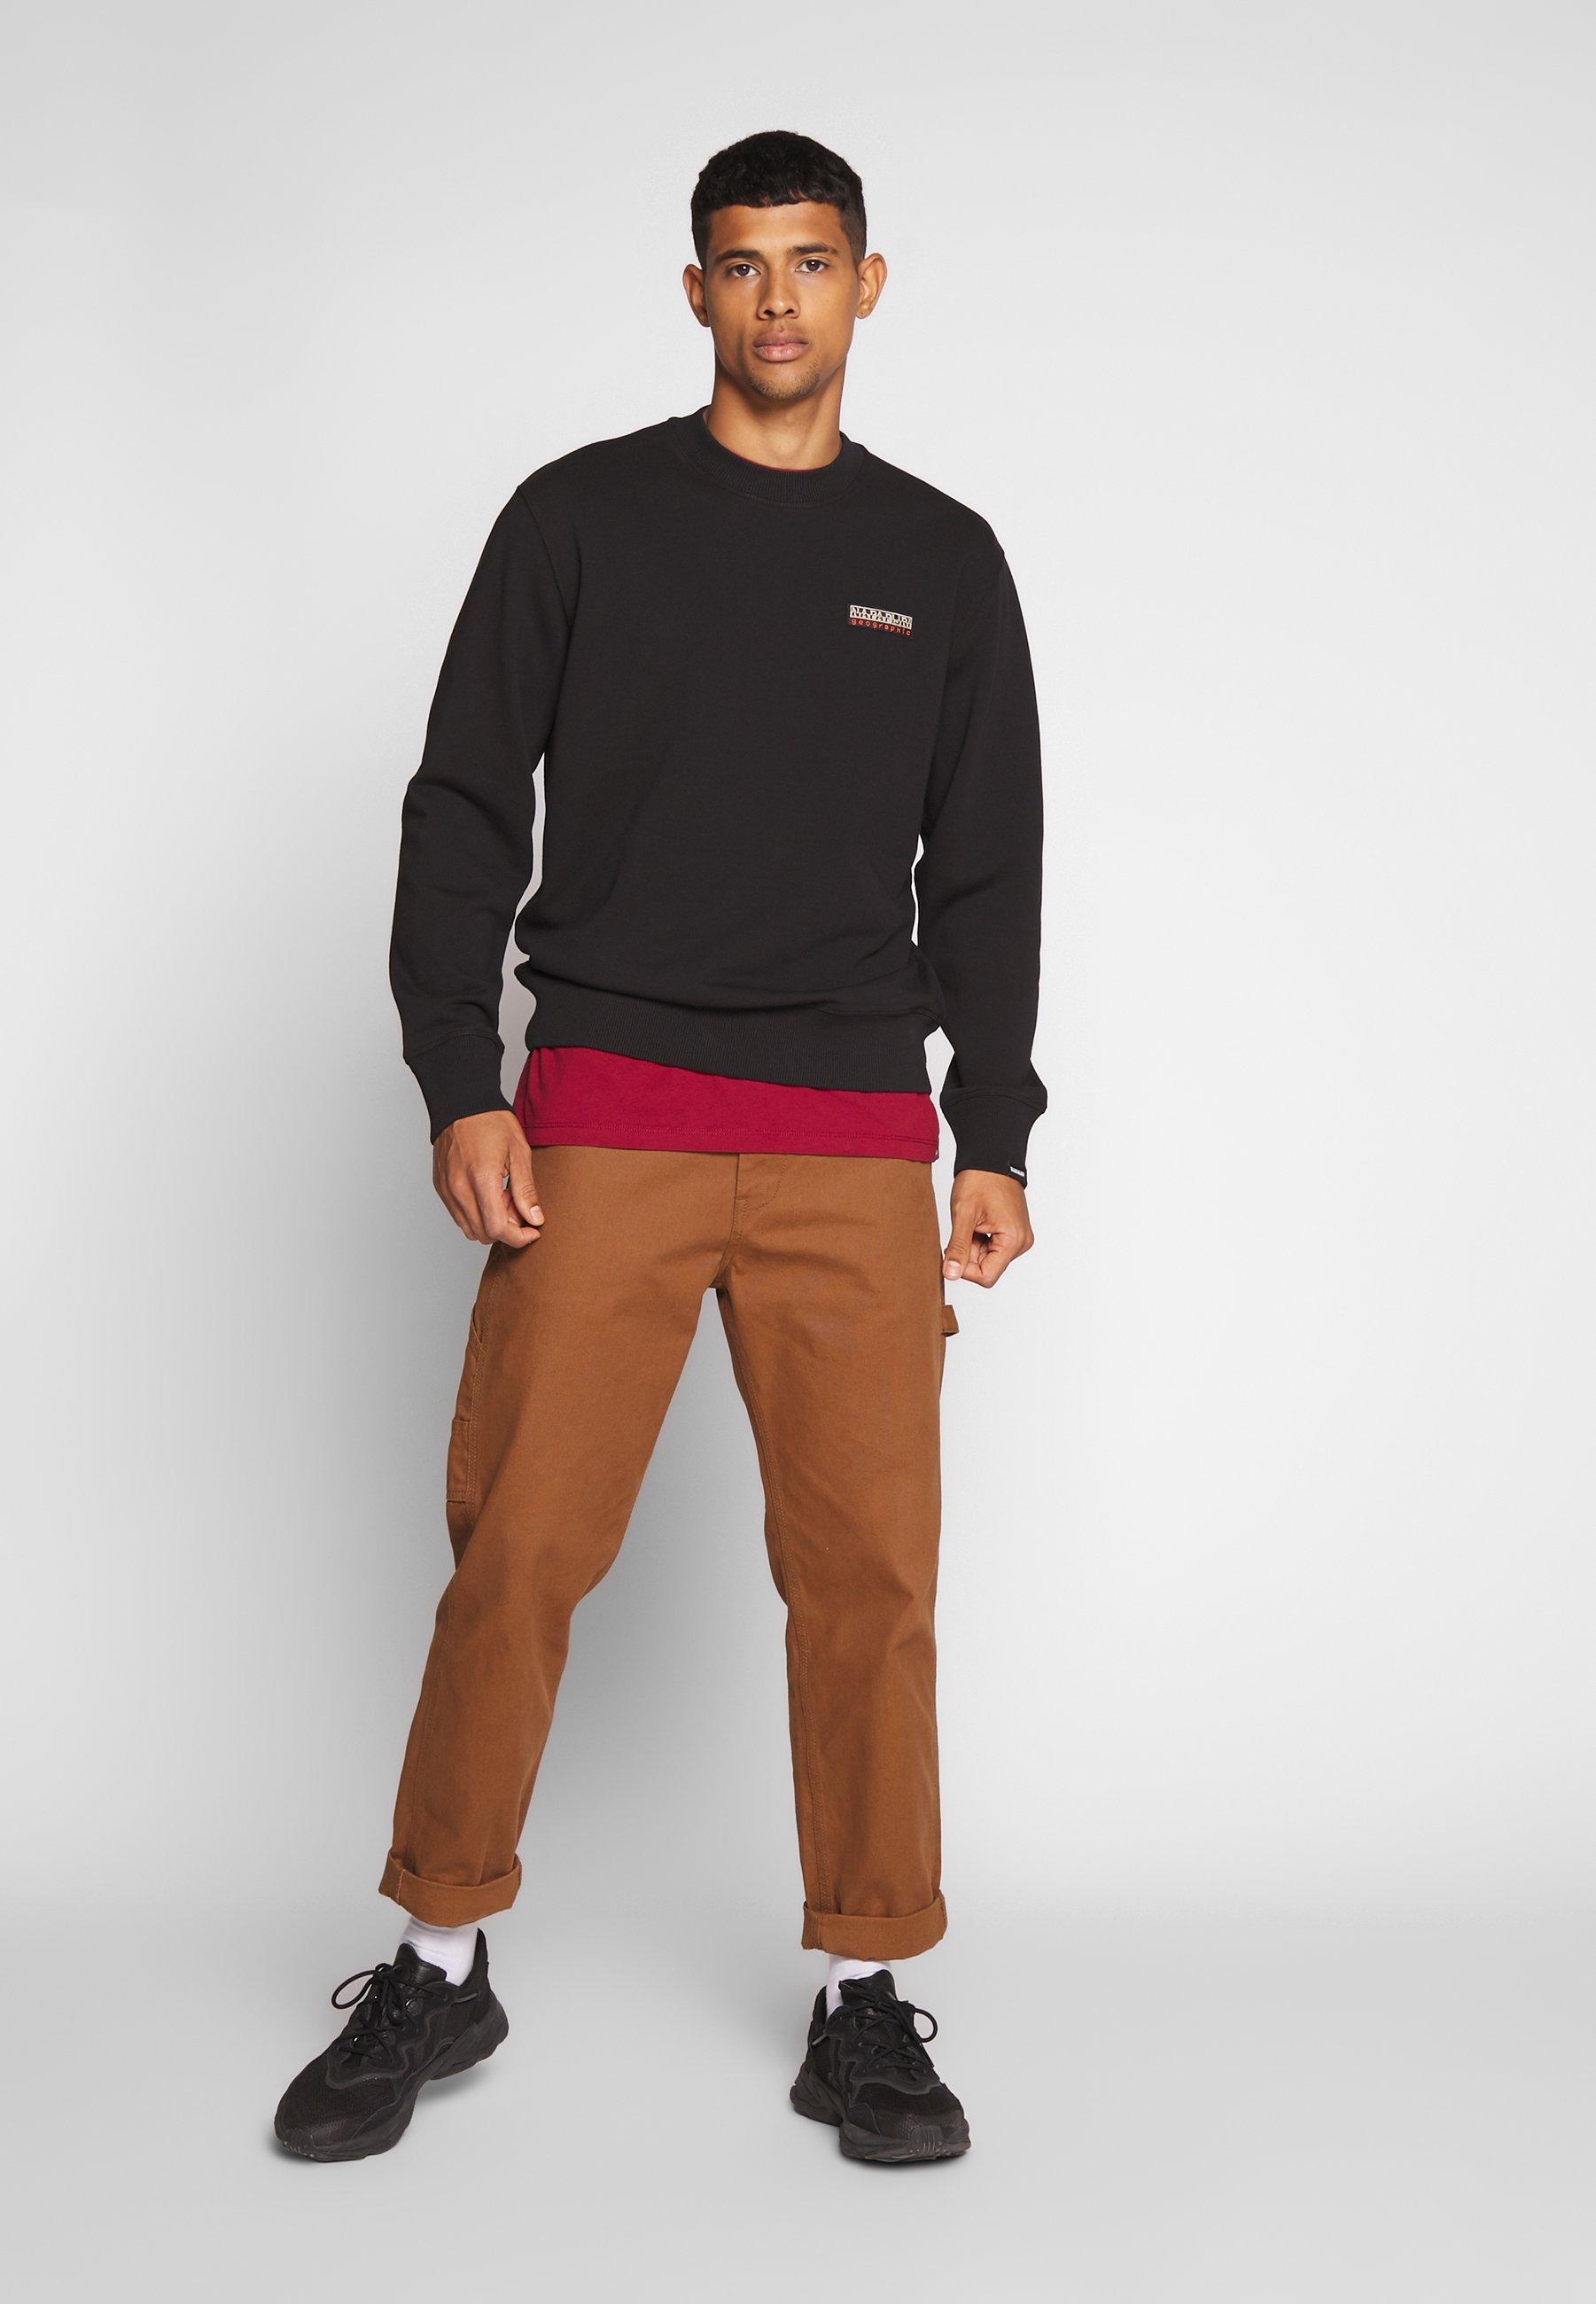 Napapijri The Tribe Base - Sweater Black